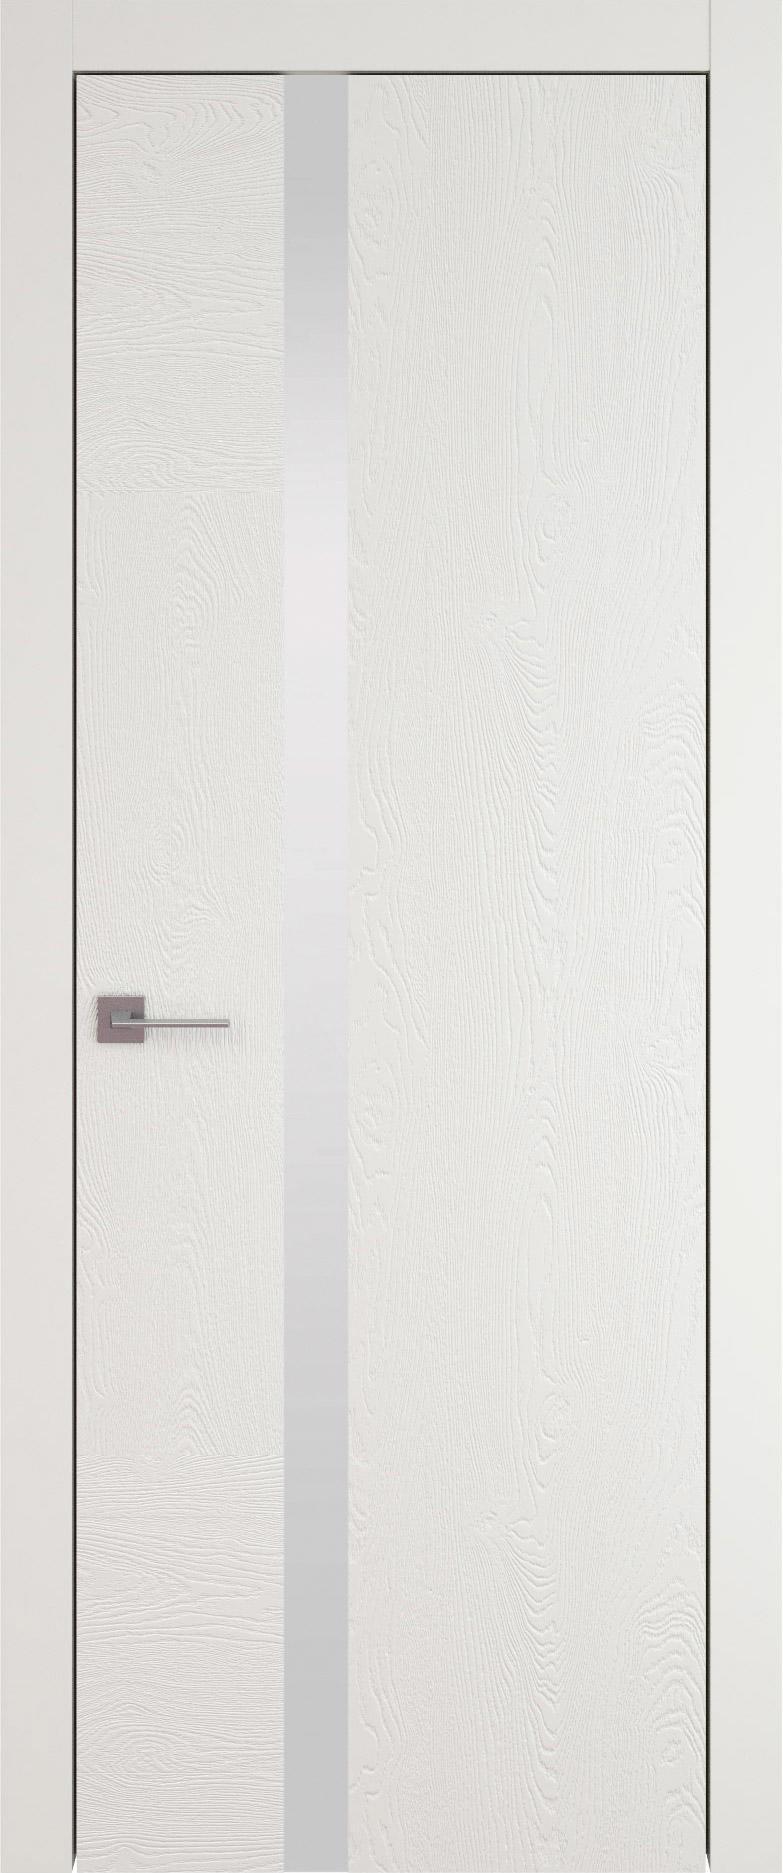 Tivoli Д-1 цвет - Бежевая эмаль по шпону (RAL 9010) Без стекла (ДГ)